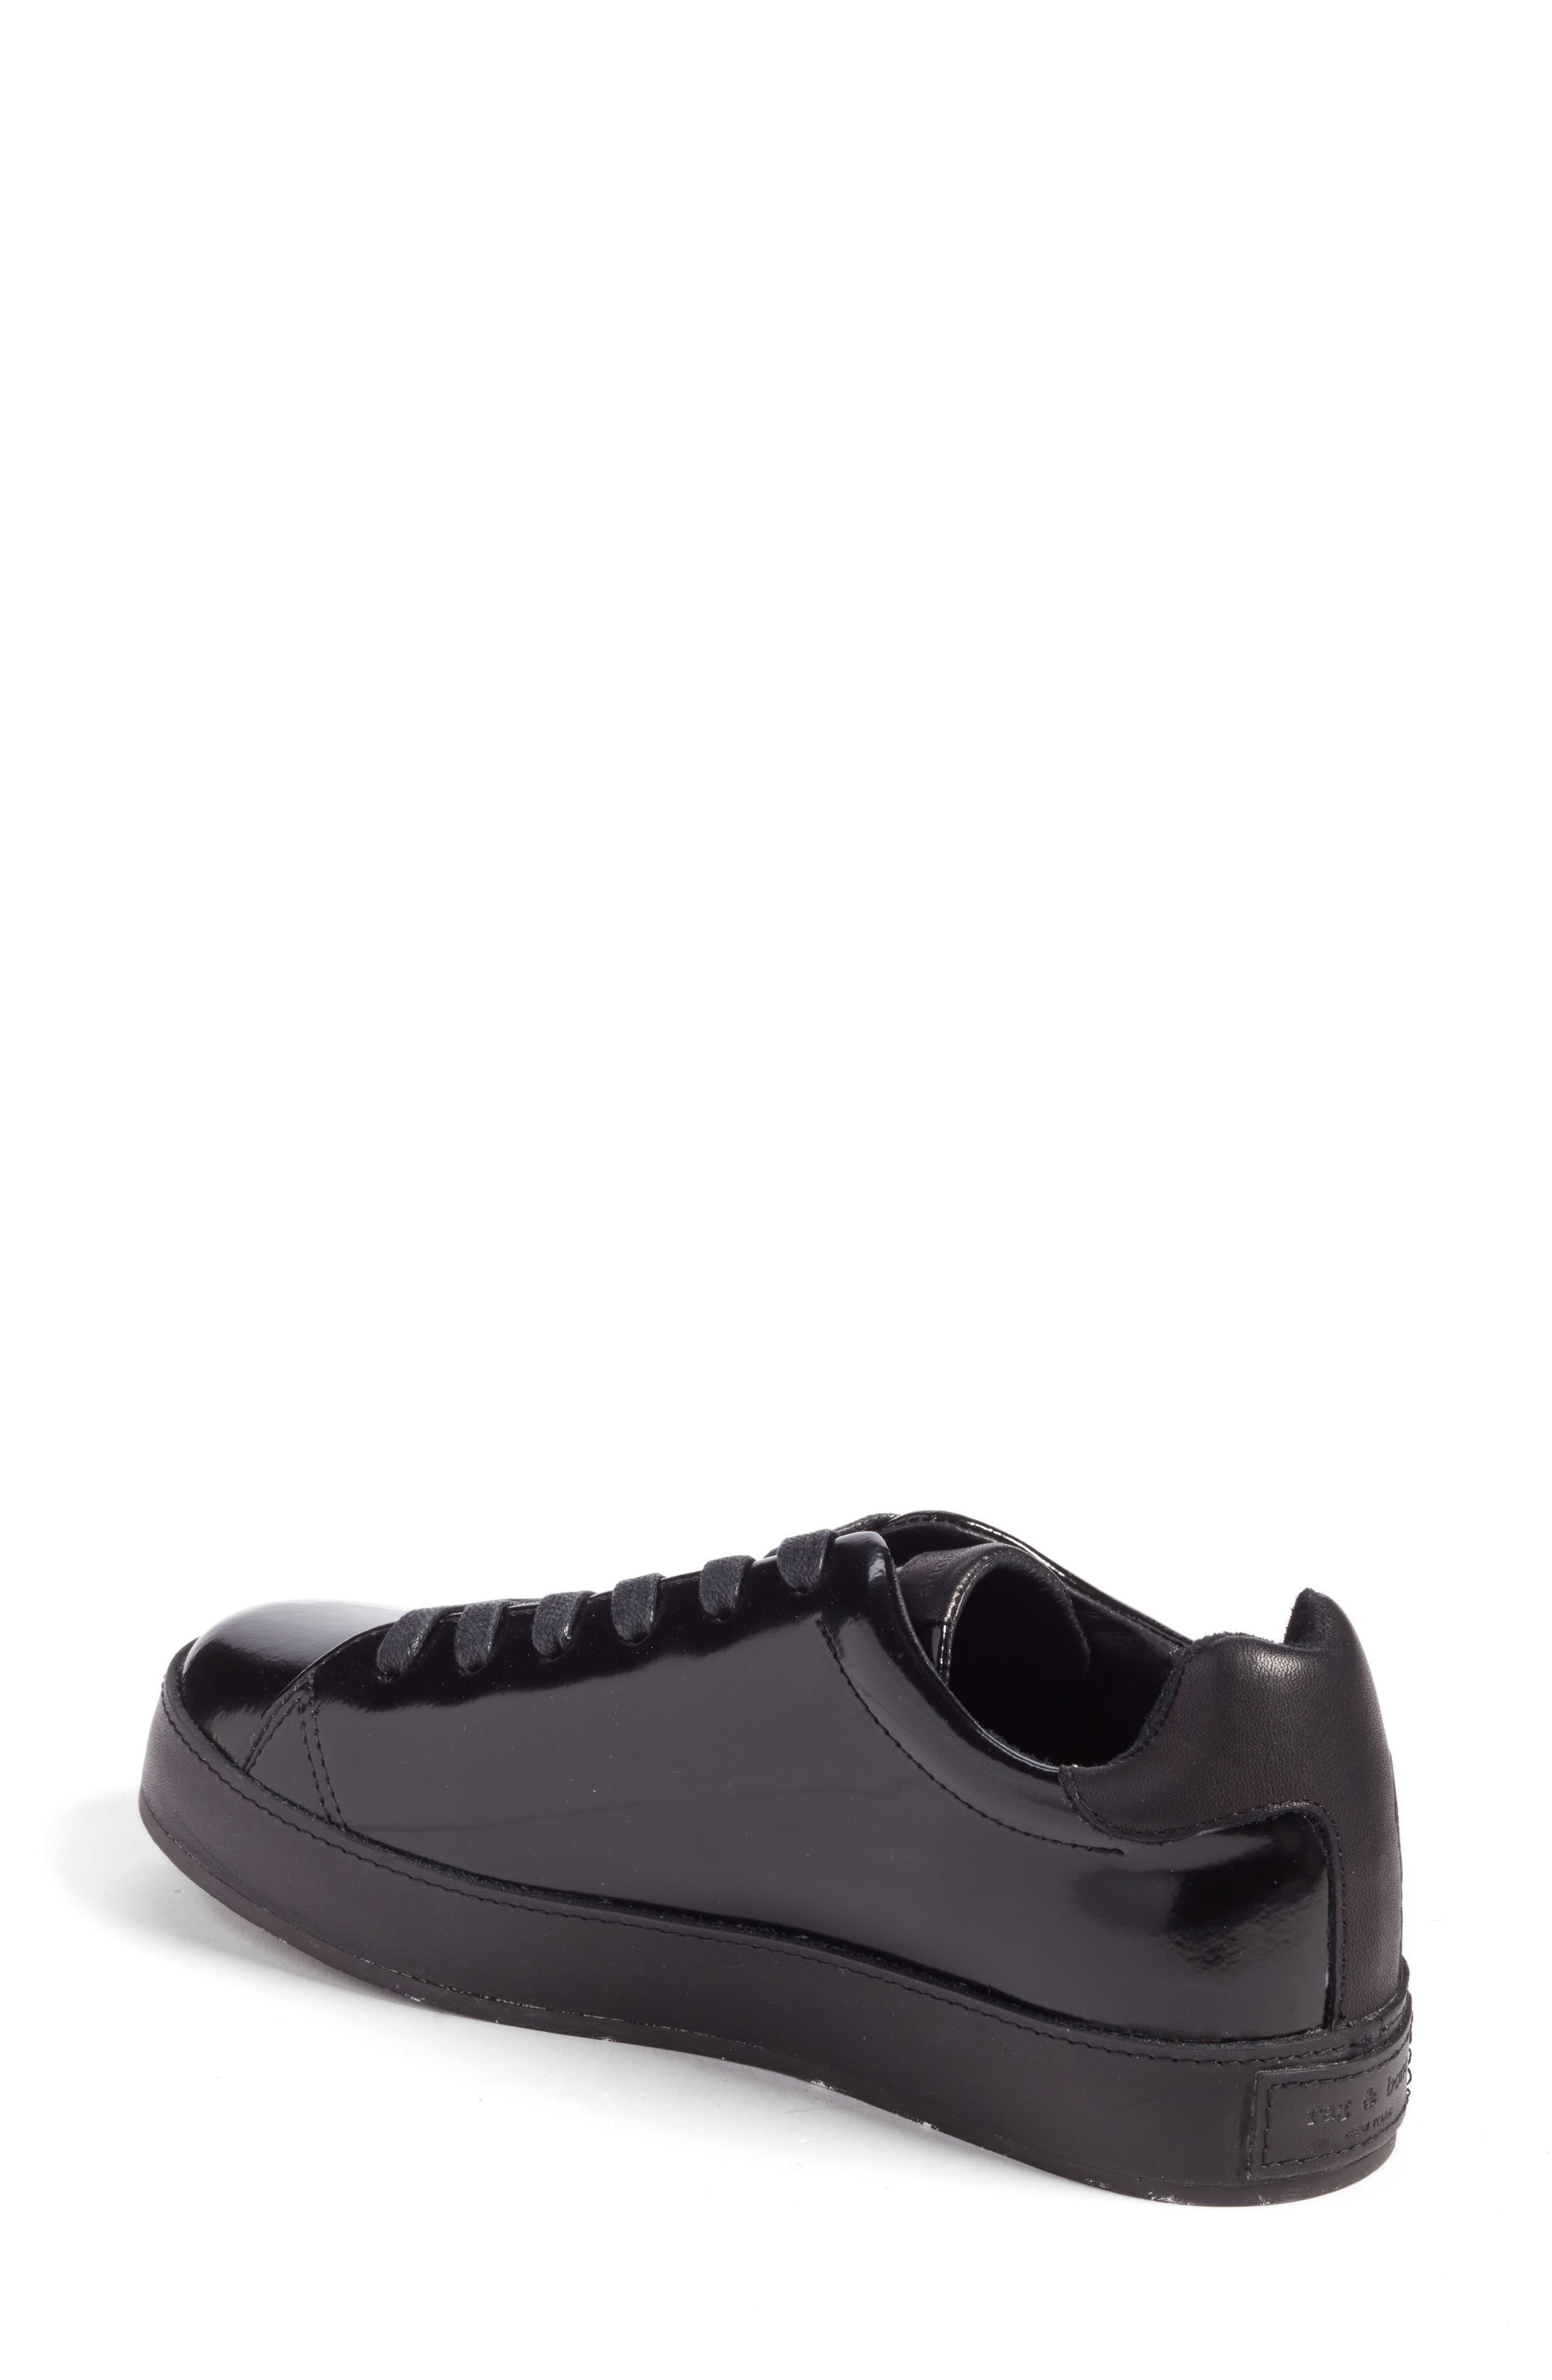 RB1 Low-Top Sneaker,                             Alternate thumbnail 2, color,                             001